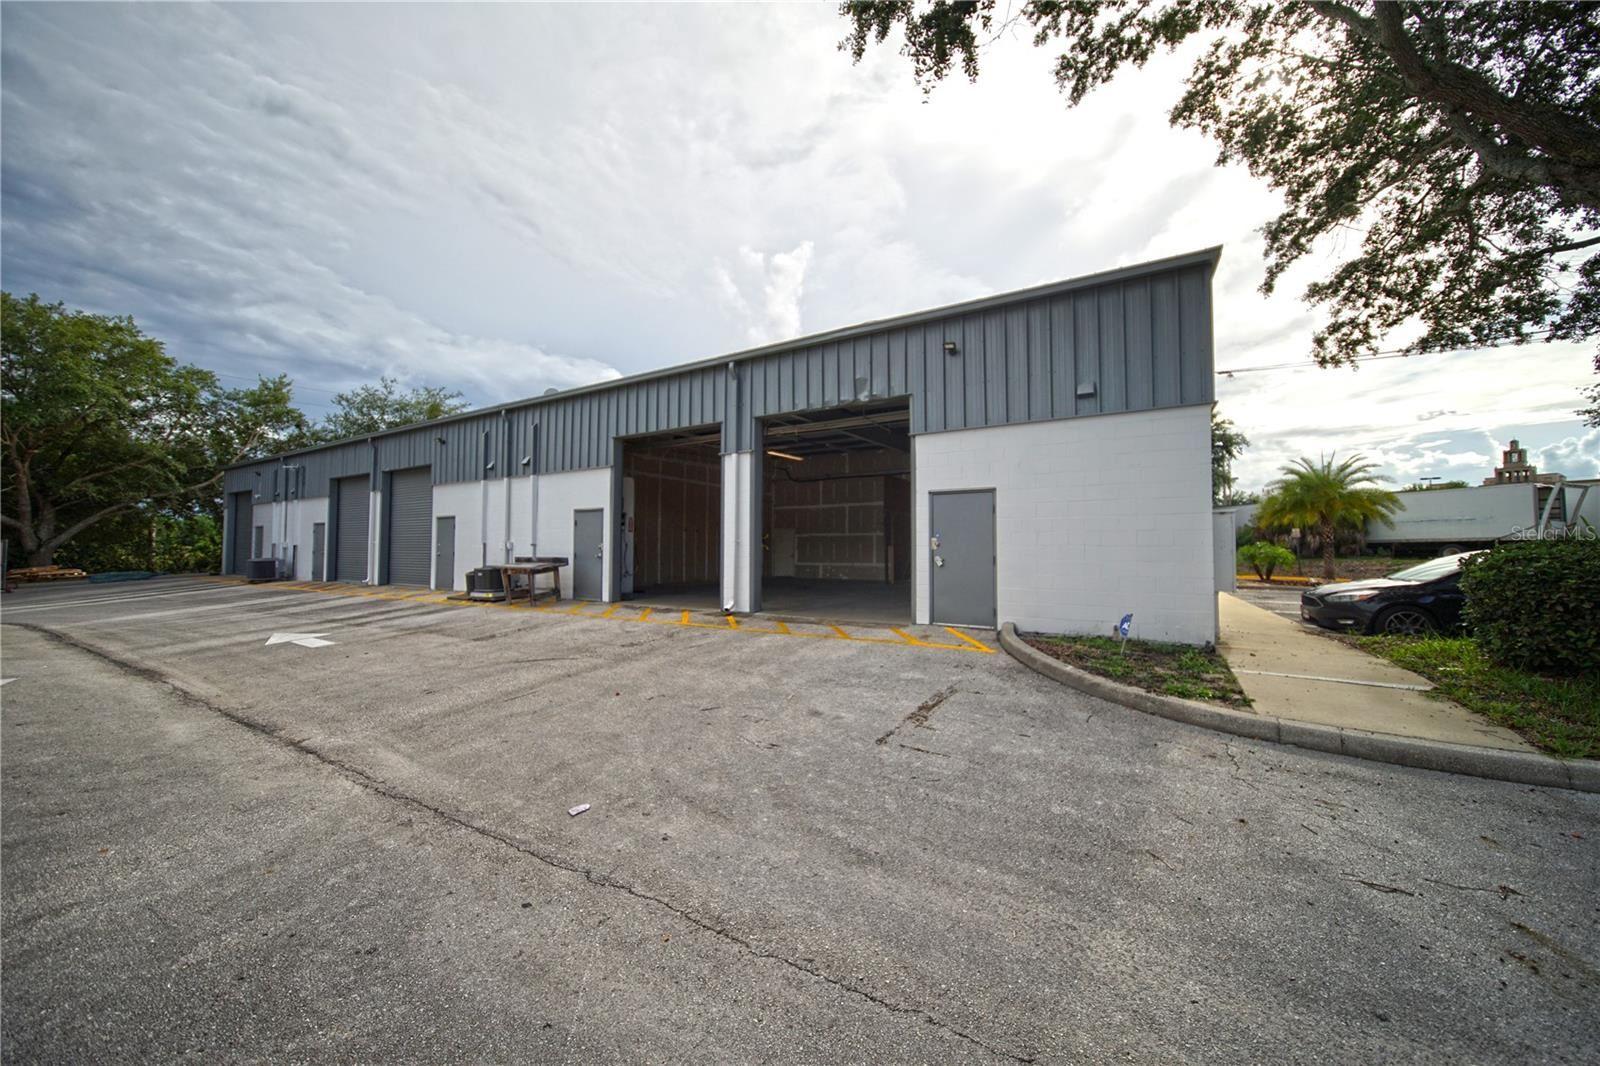 1630 TROPIC PARK DRIVE #1630W, Sanford, FL 32773 - #: O5944955